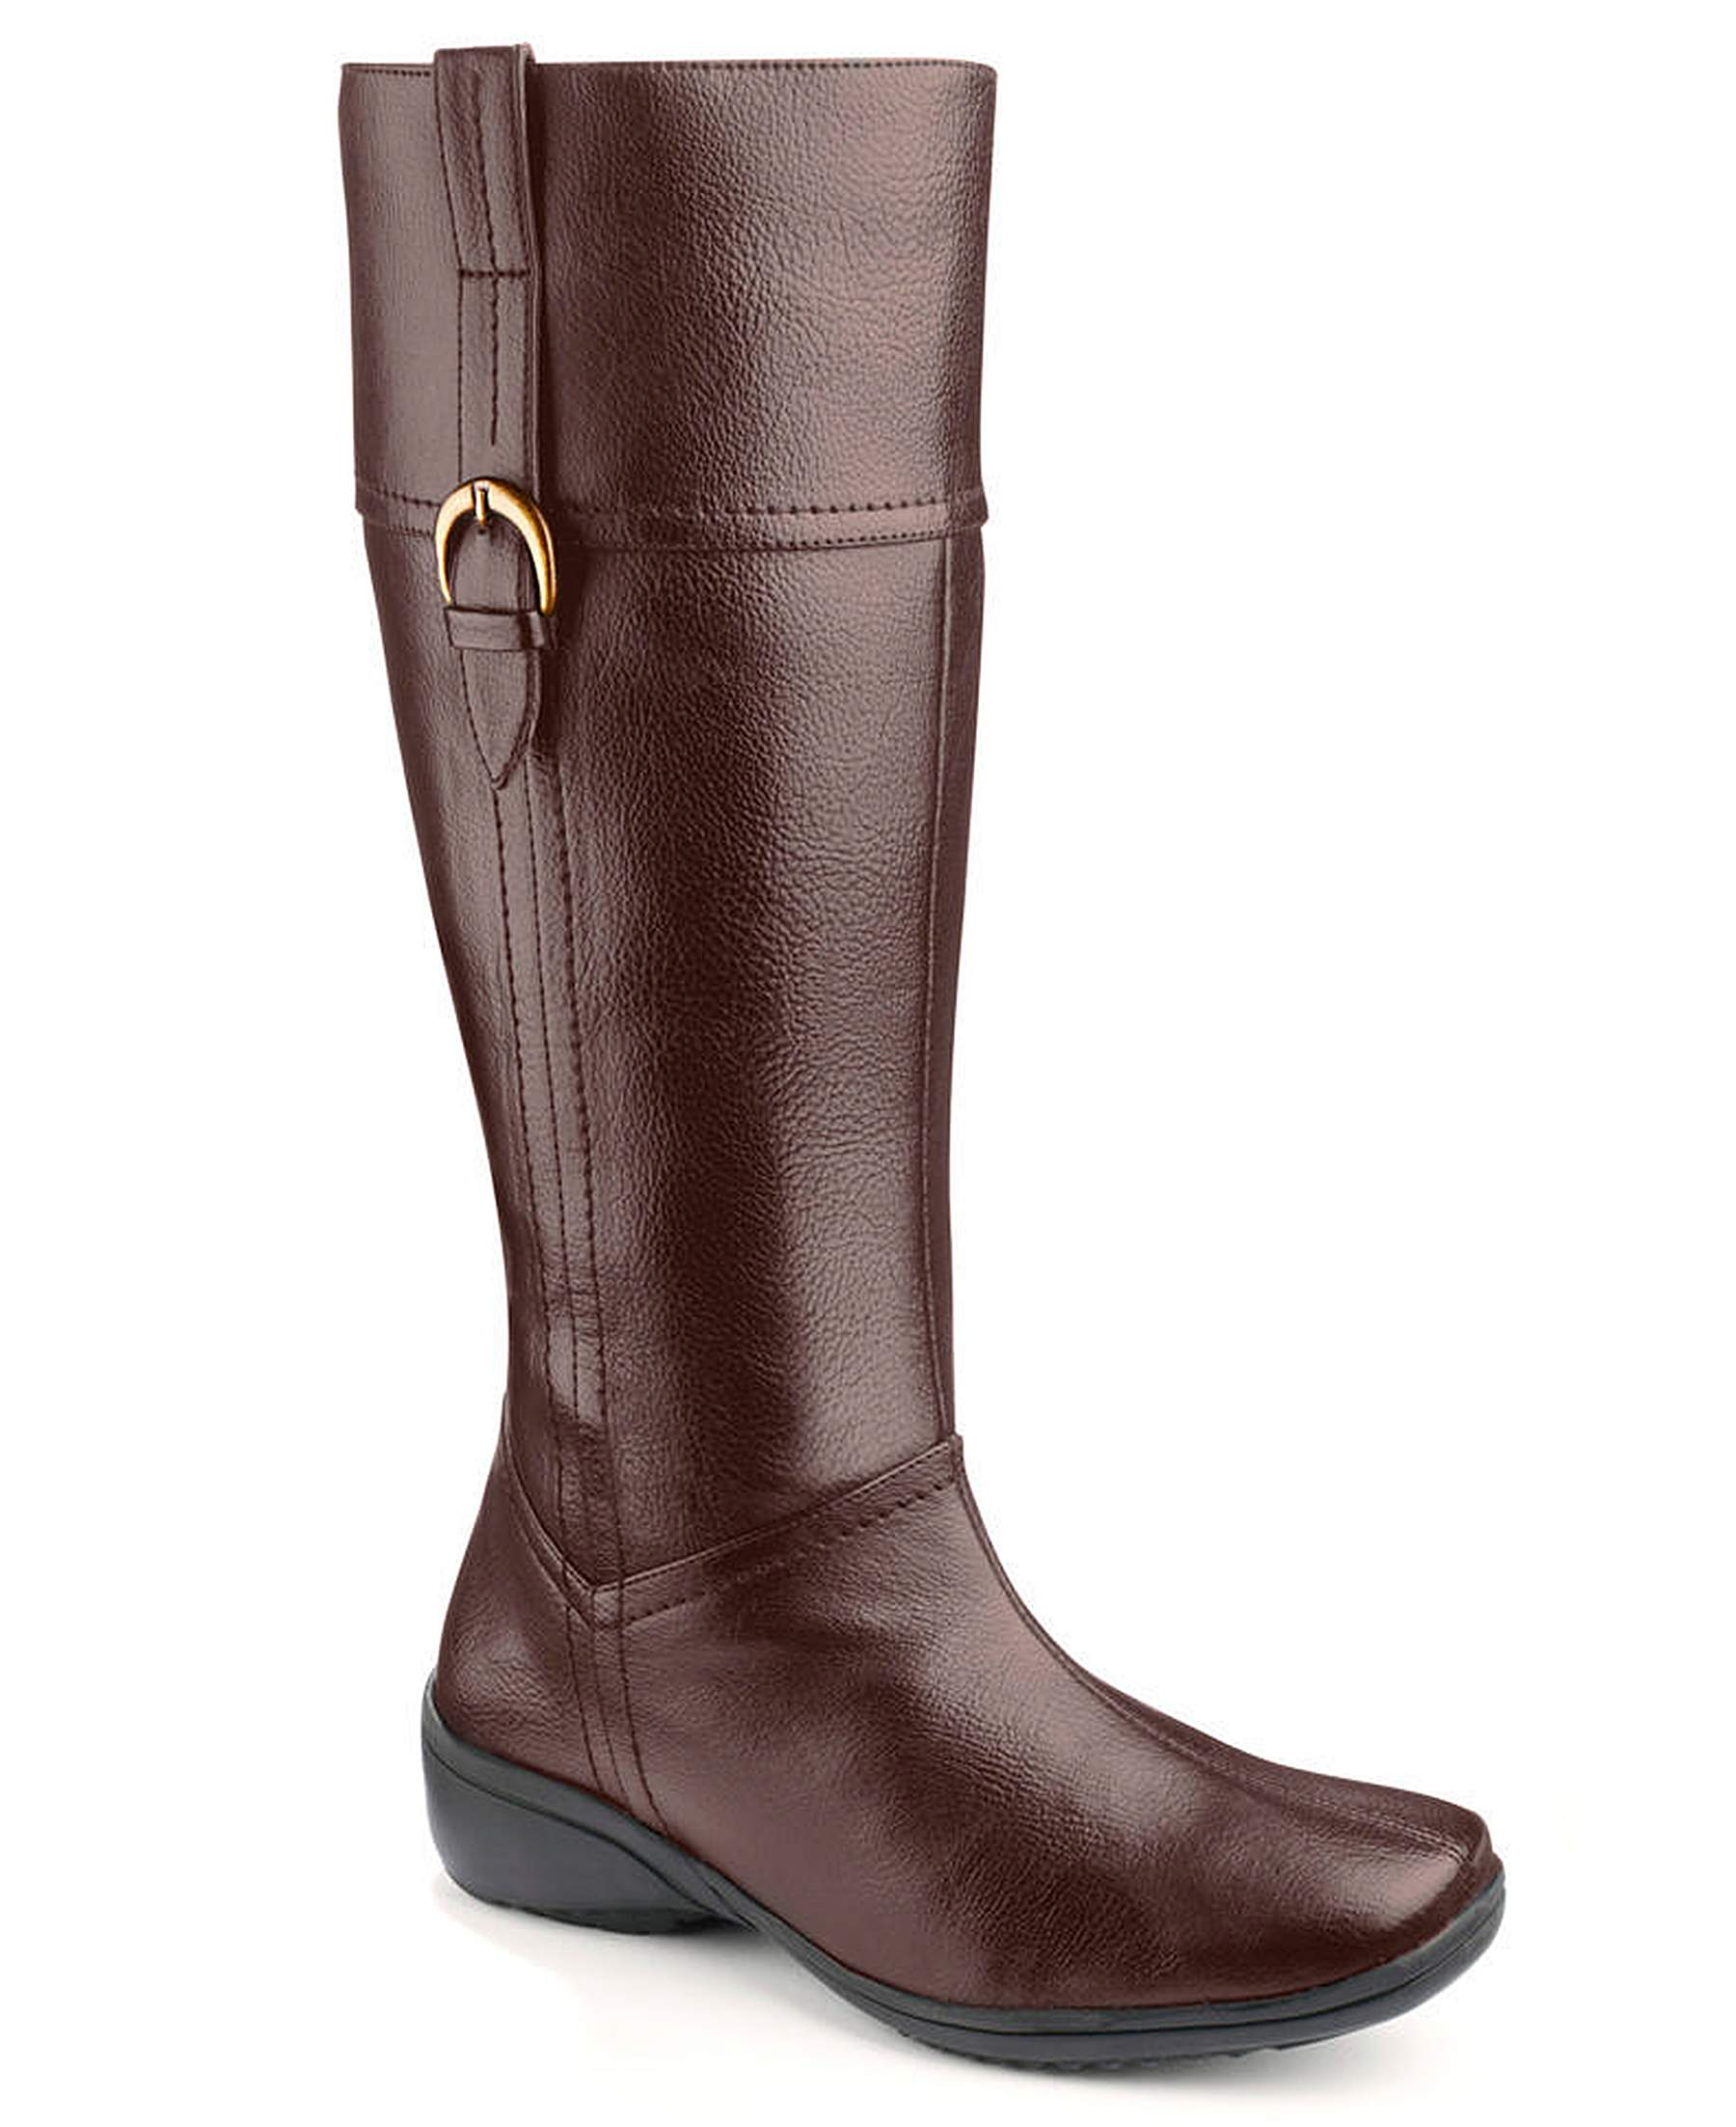 0f10a62802e0 Legroom Boots EEE Fit Standard Calf Width